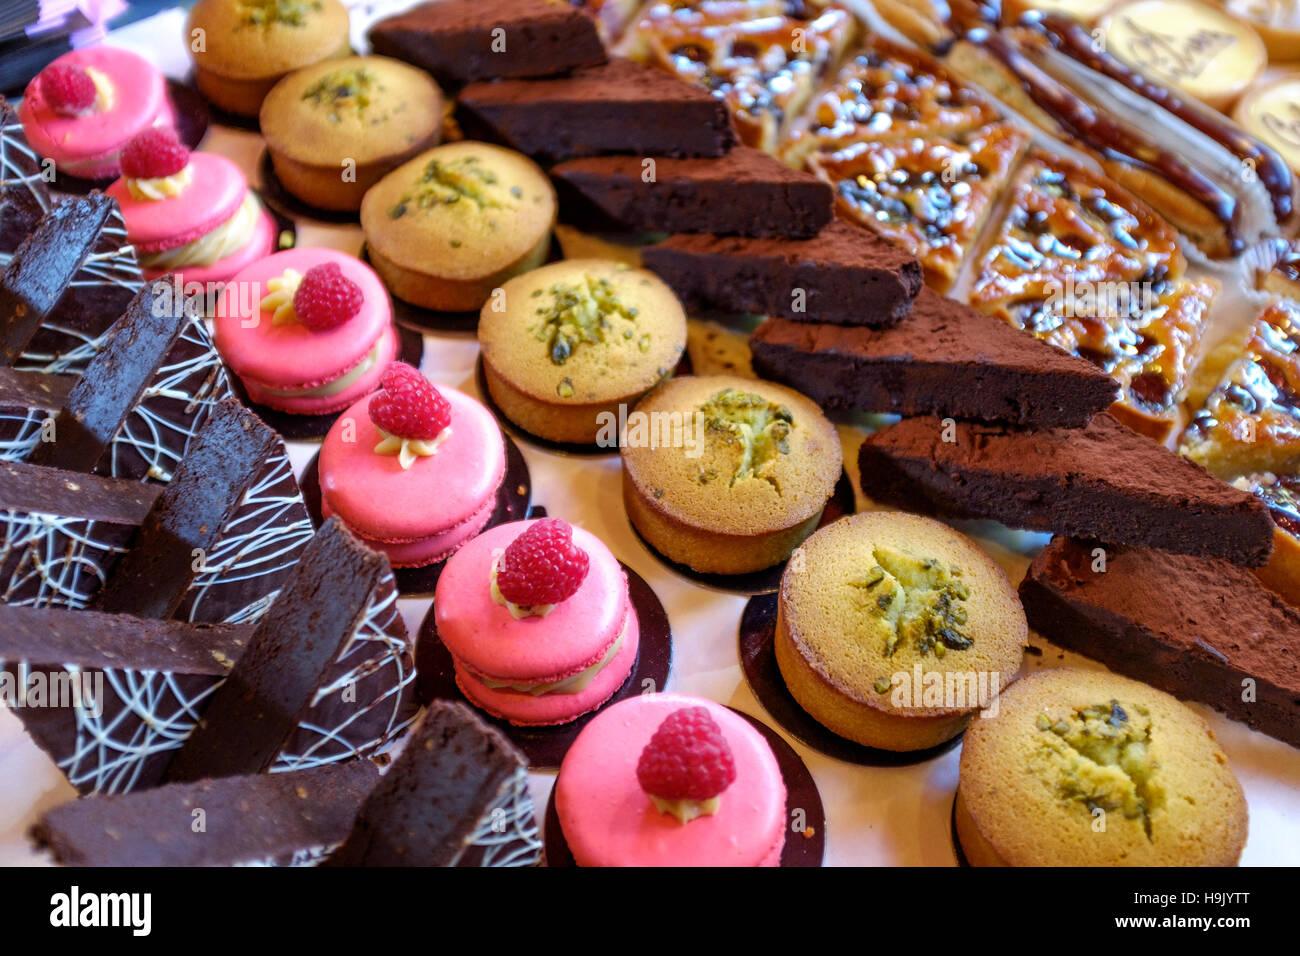 Wüsten-Auswahl-Cup cakes, Himbeer Makronen, Schokolade Kuchen Stockbild